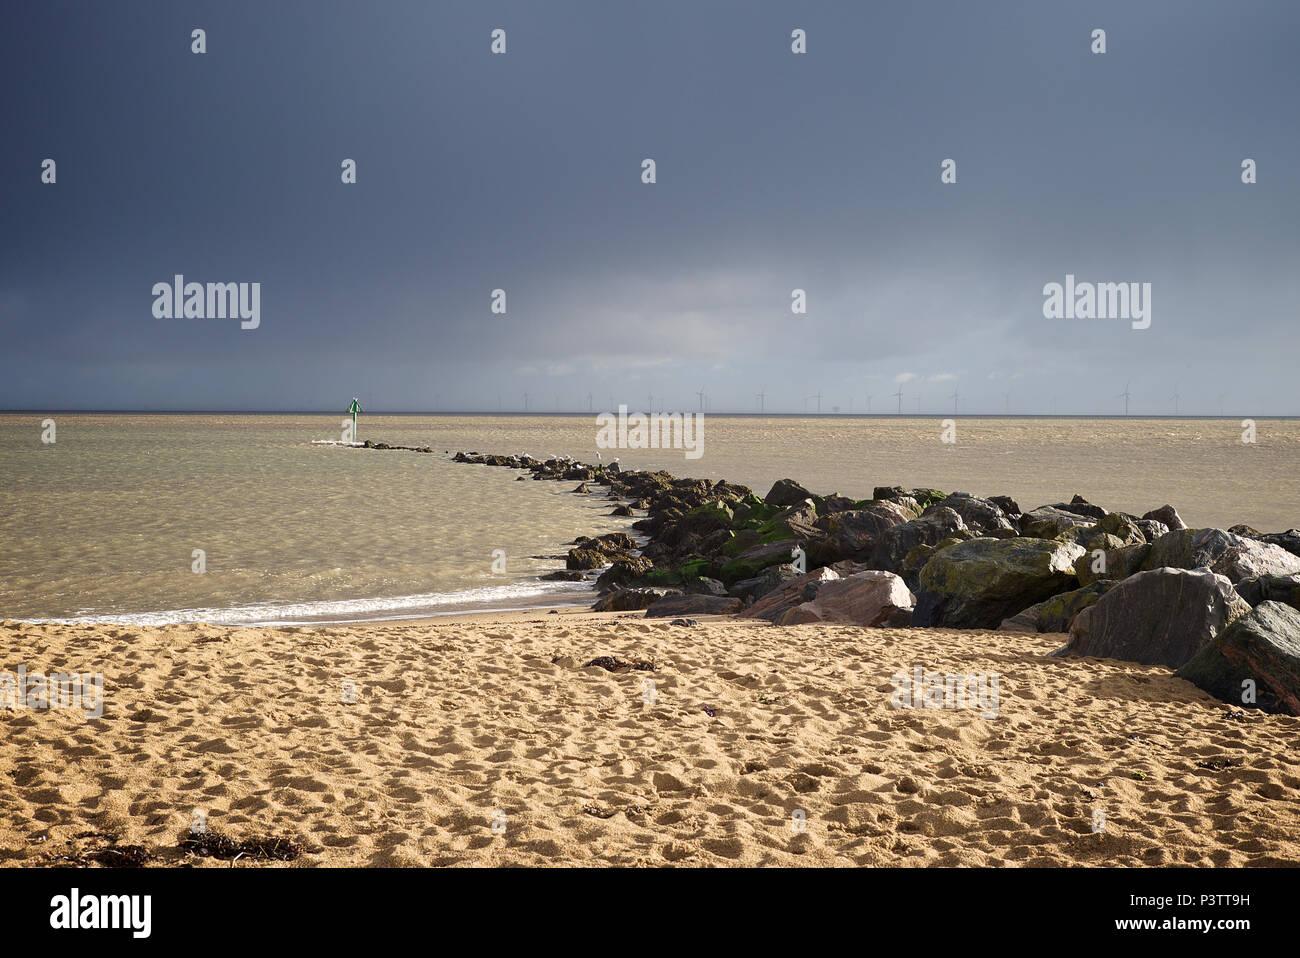 Wind turbines at Gunfleet Sands just off shore of Clacton on Sea Essex. - Stock Image